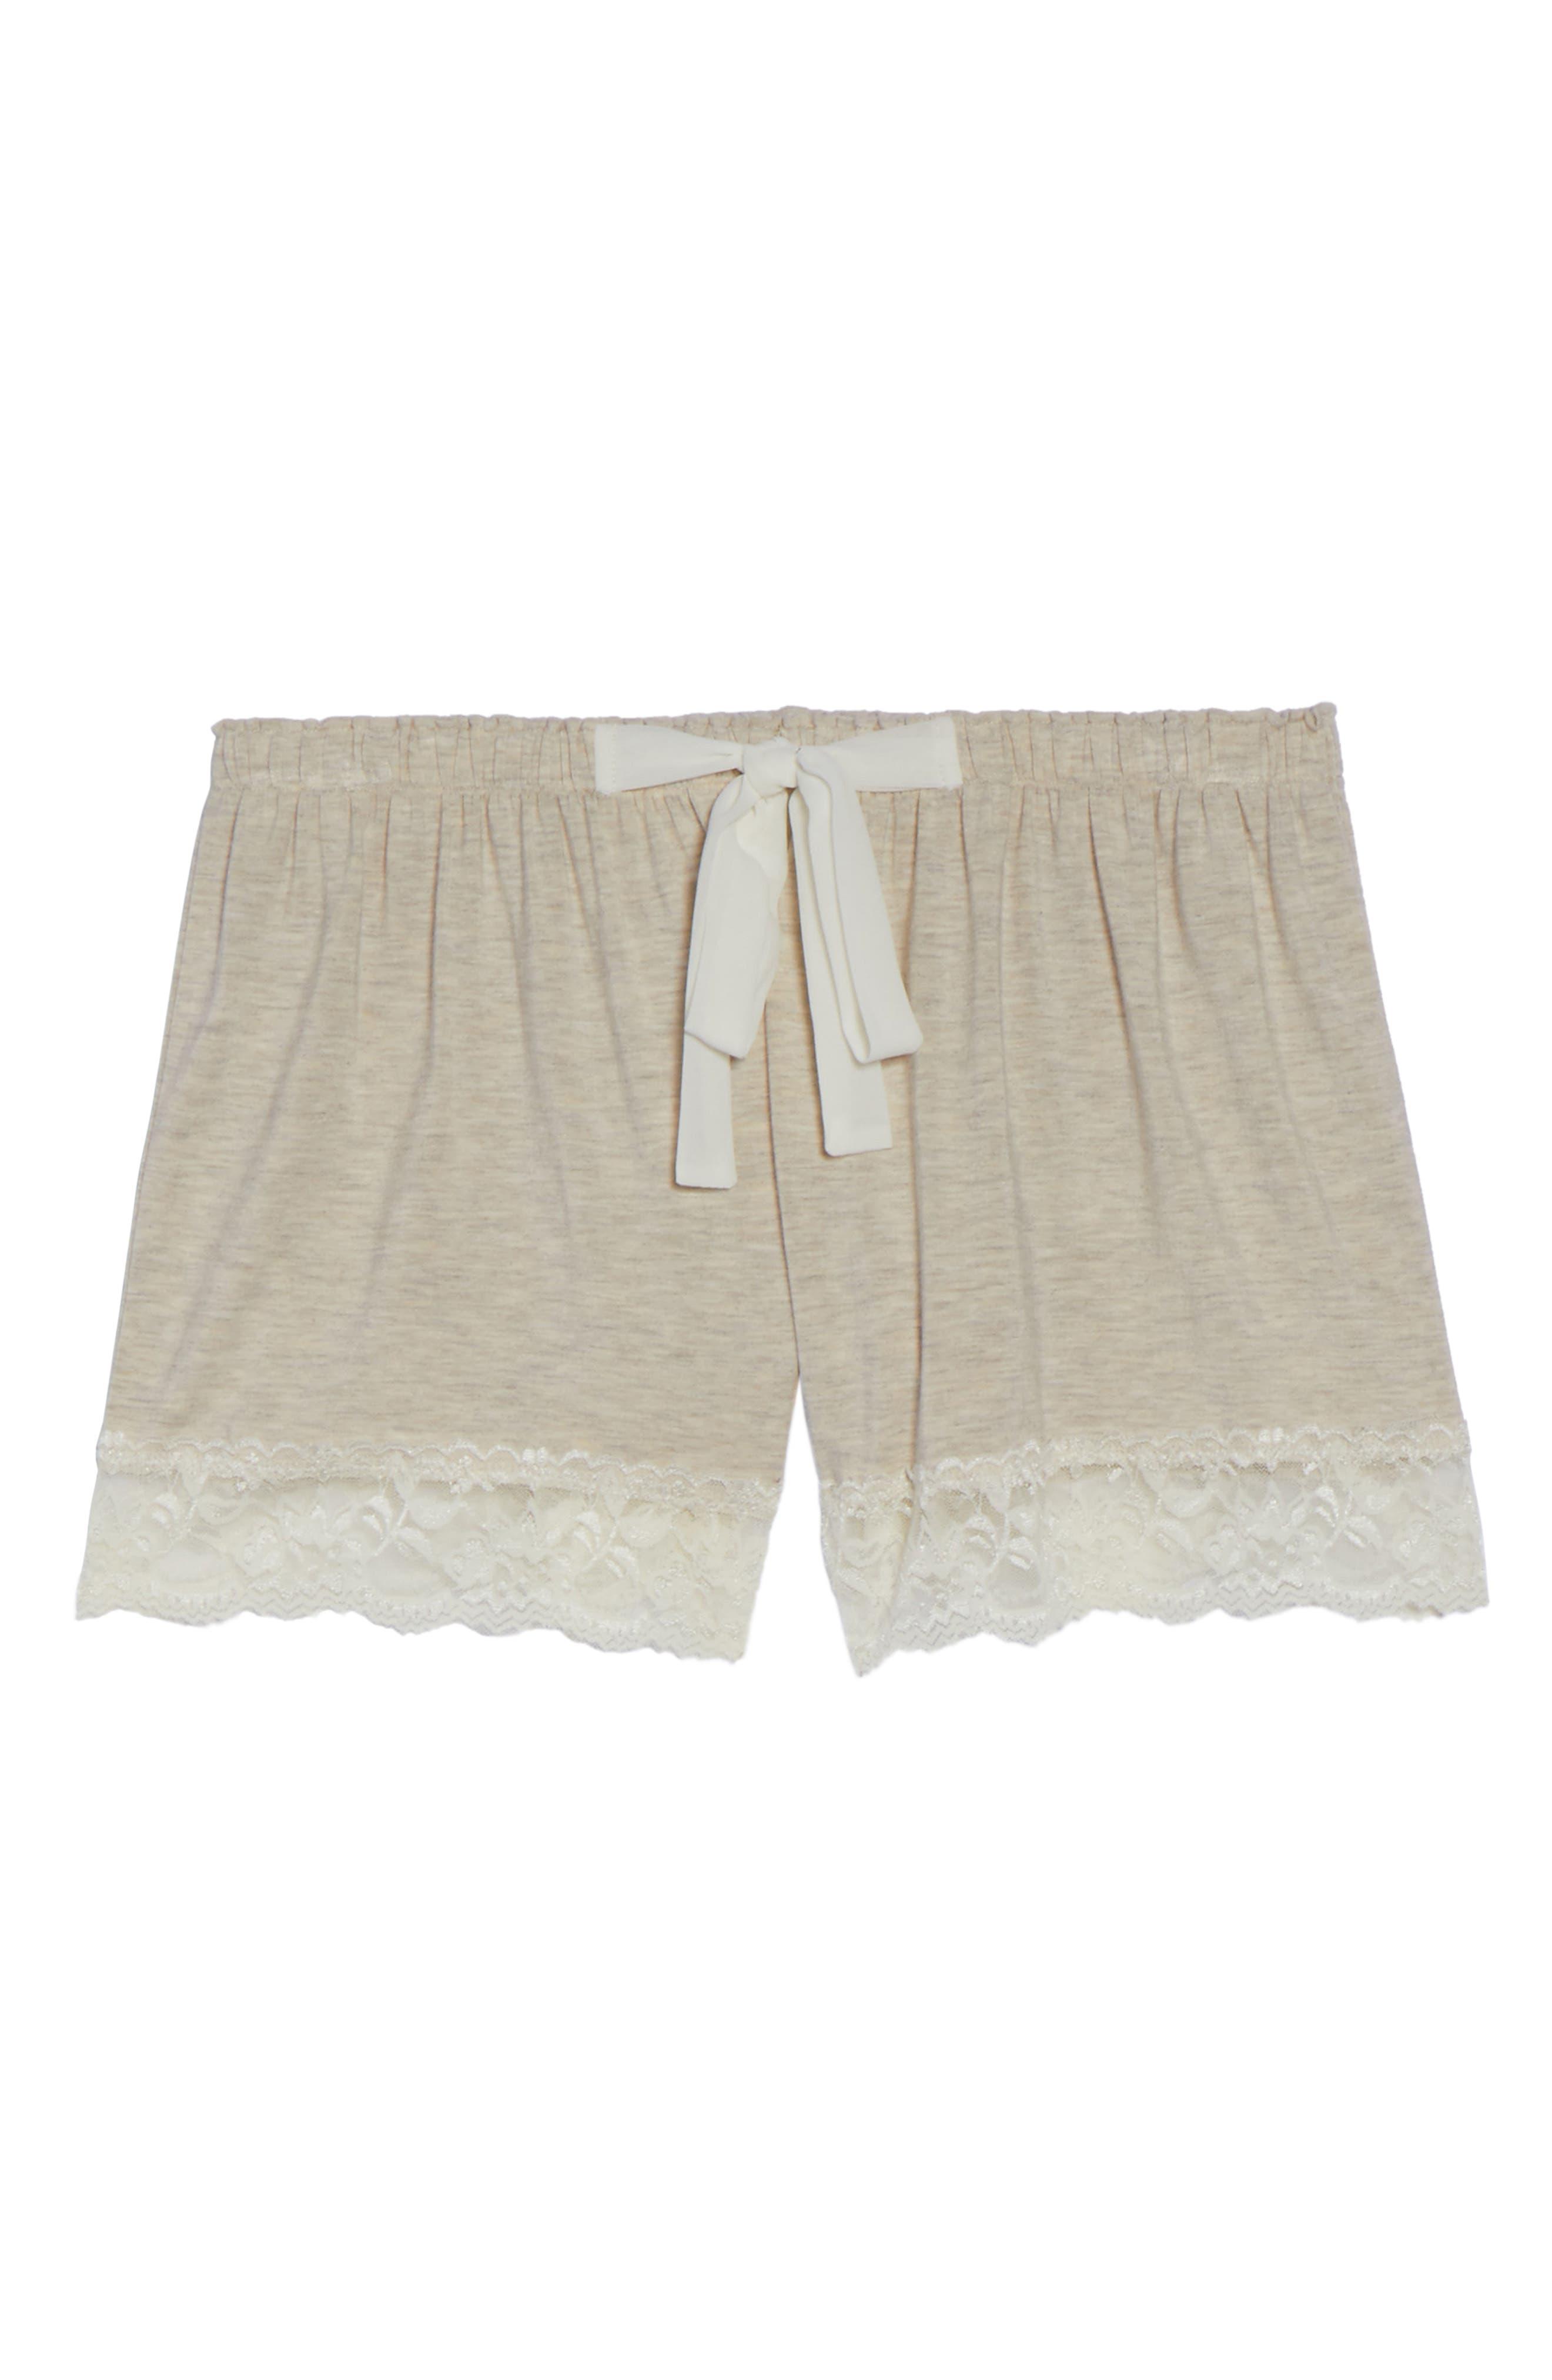 Flora Nikrooz Snuggle Lounge Shorts,                             Alternate thumbnail 6, color,                             OATMEAL